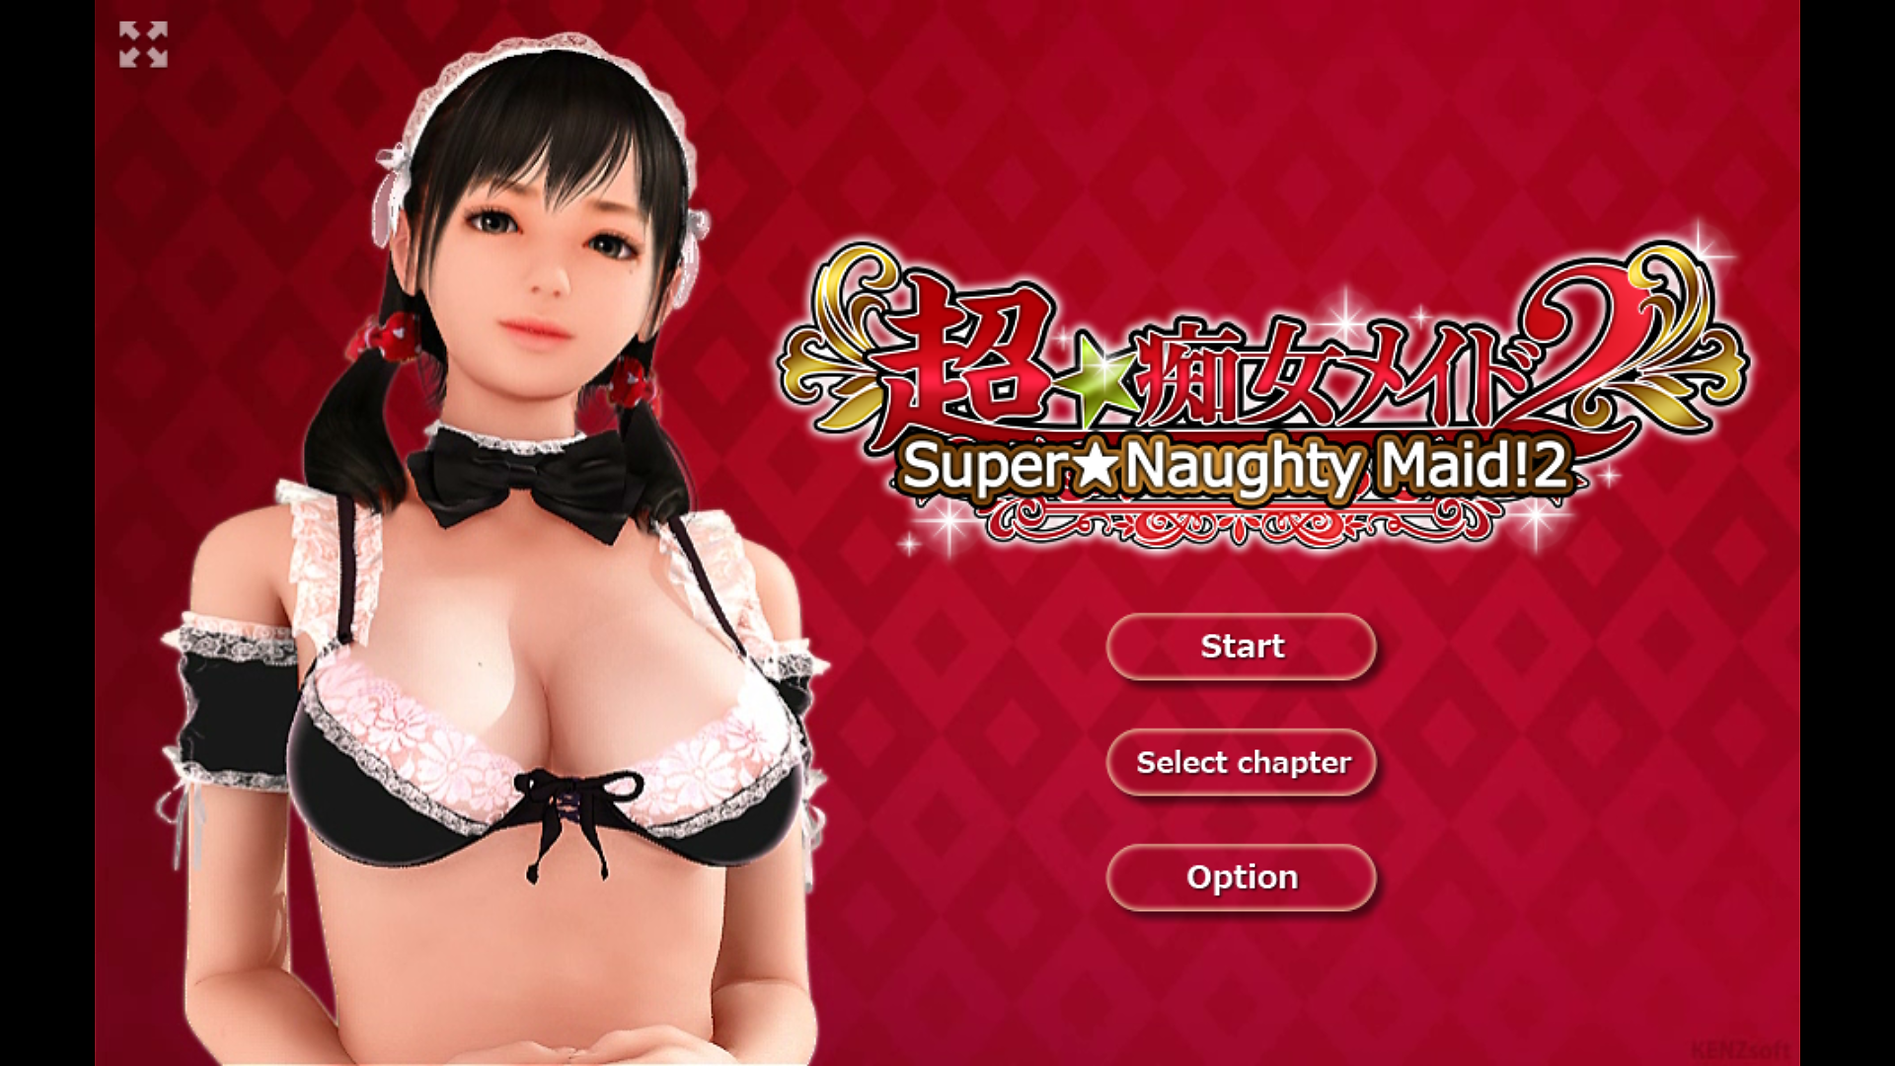 Super Naughty Maid Main - Haru's Harem.p